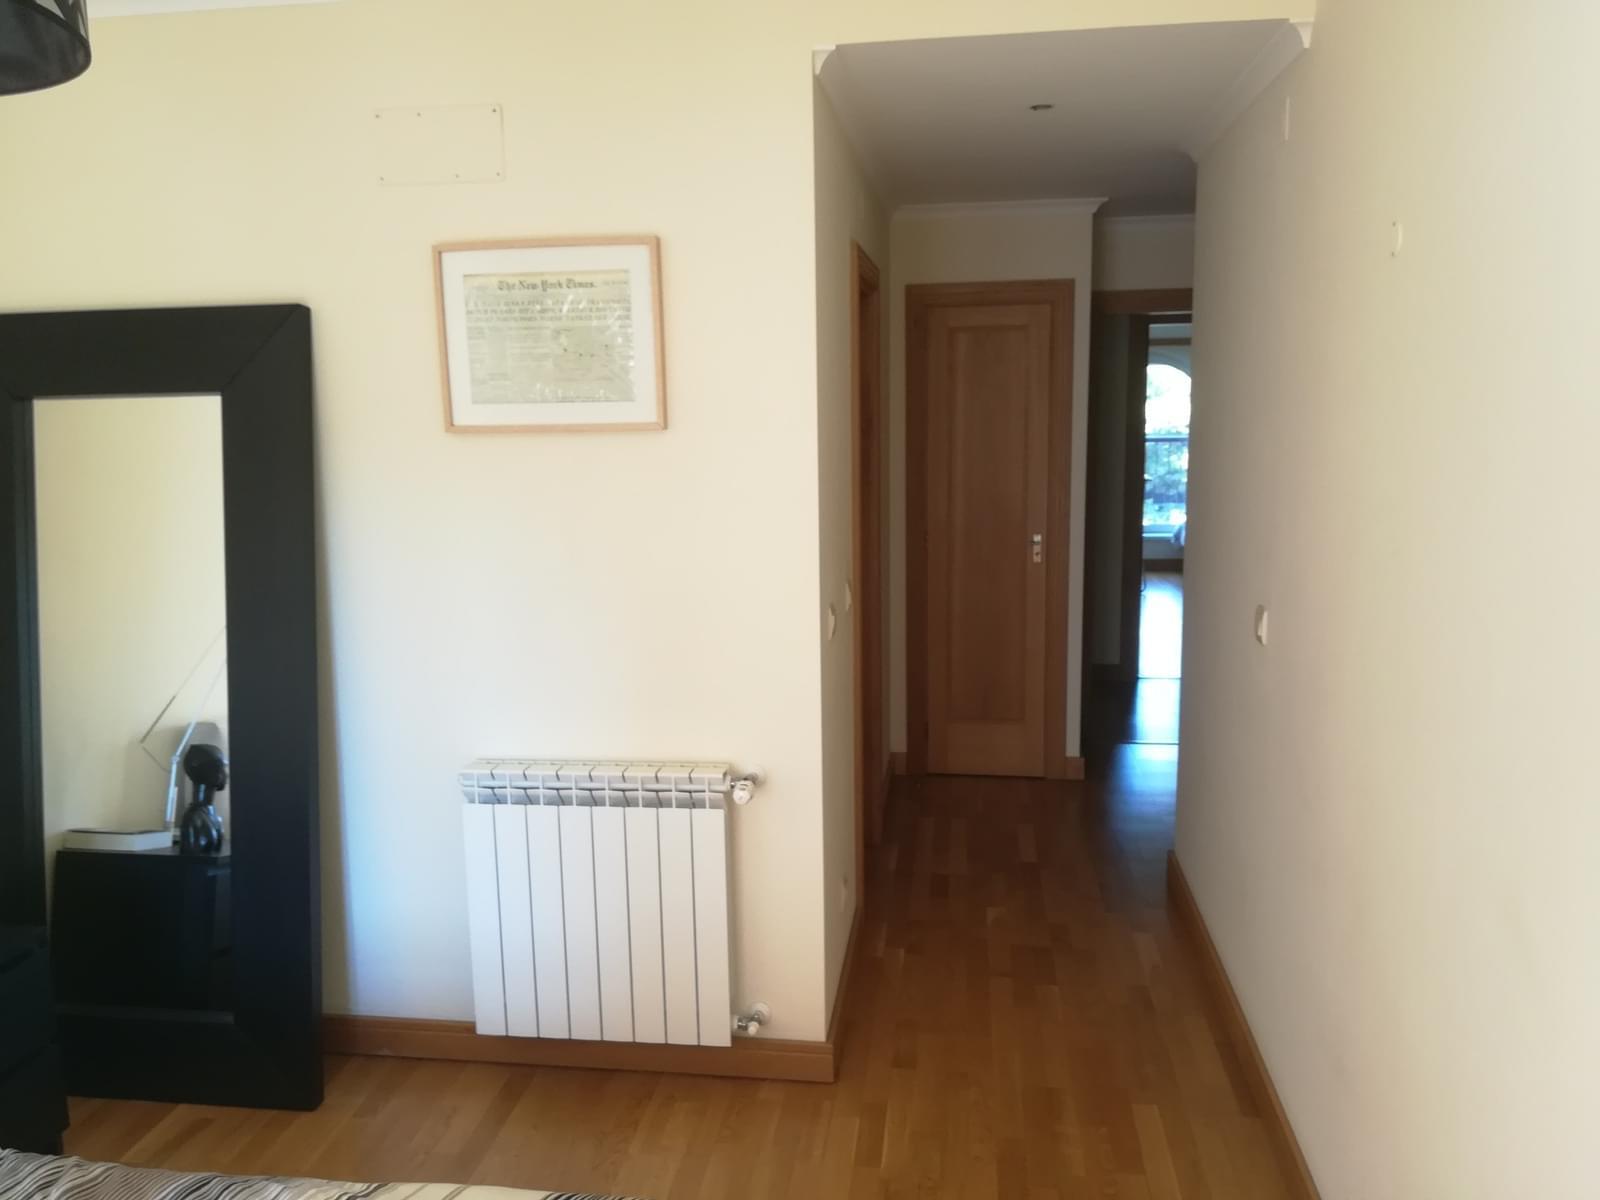 pf17981-apartamento-t3-00a520e1-445b-49ac-b7b1-024cadb5307d